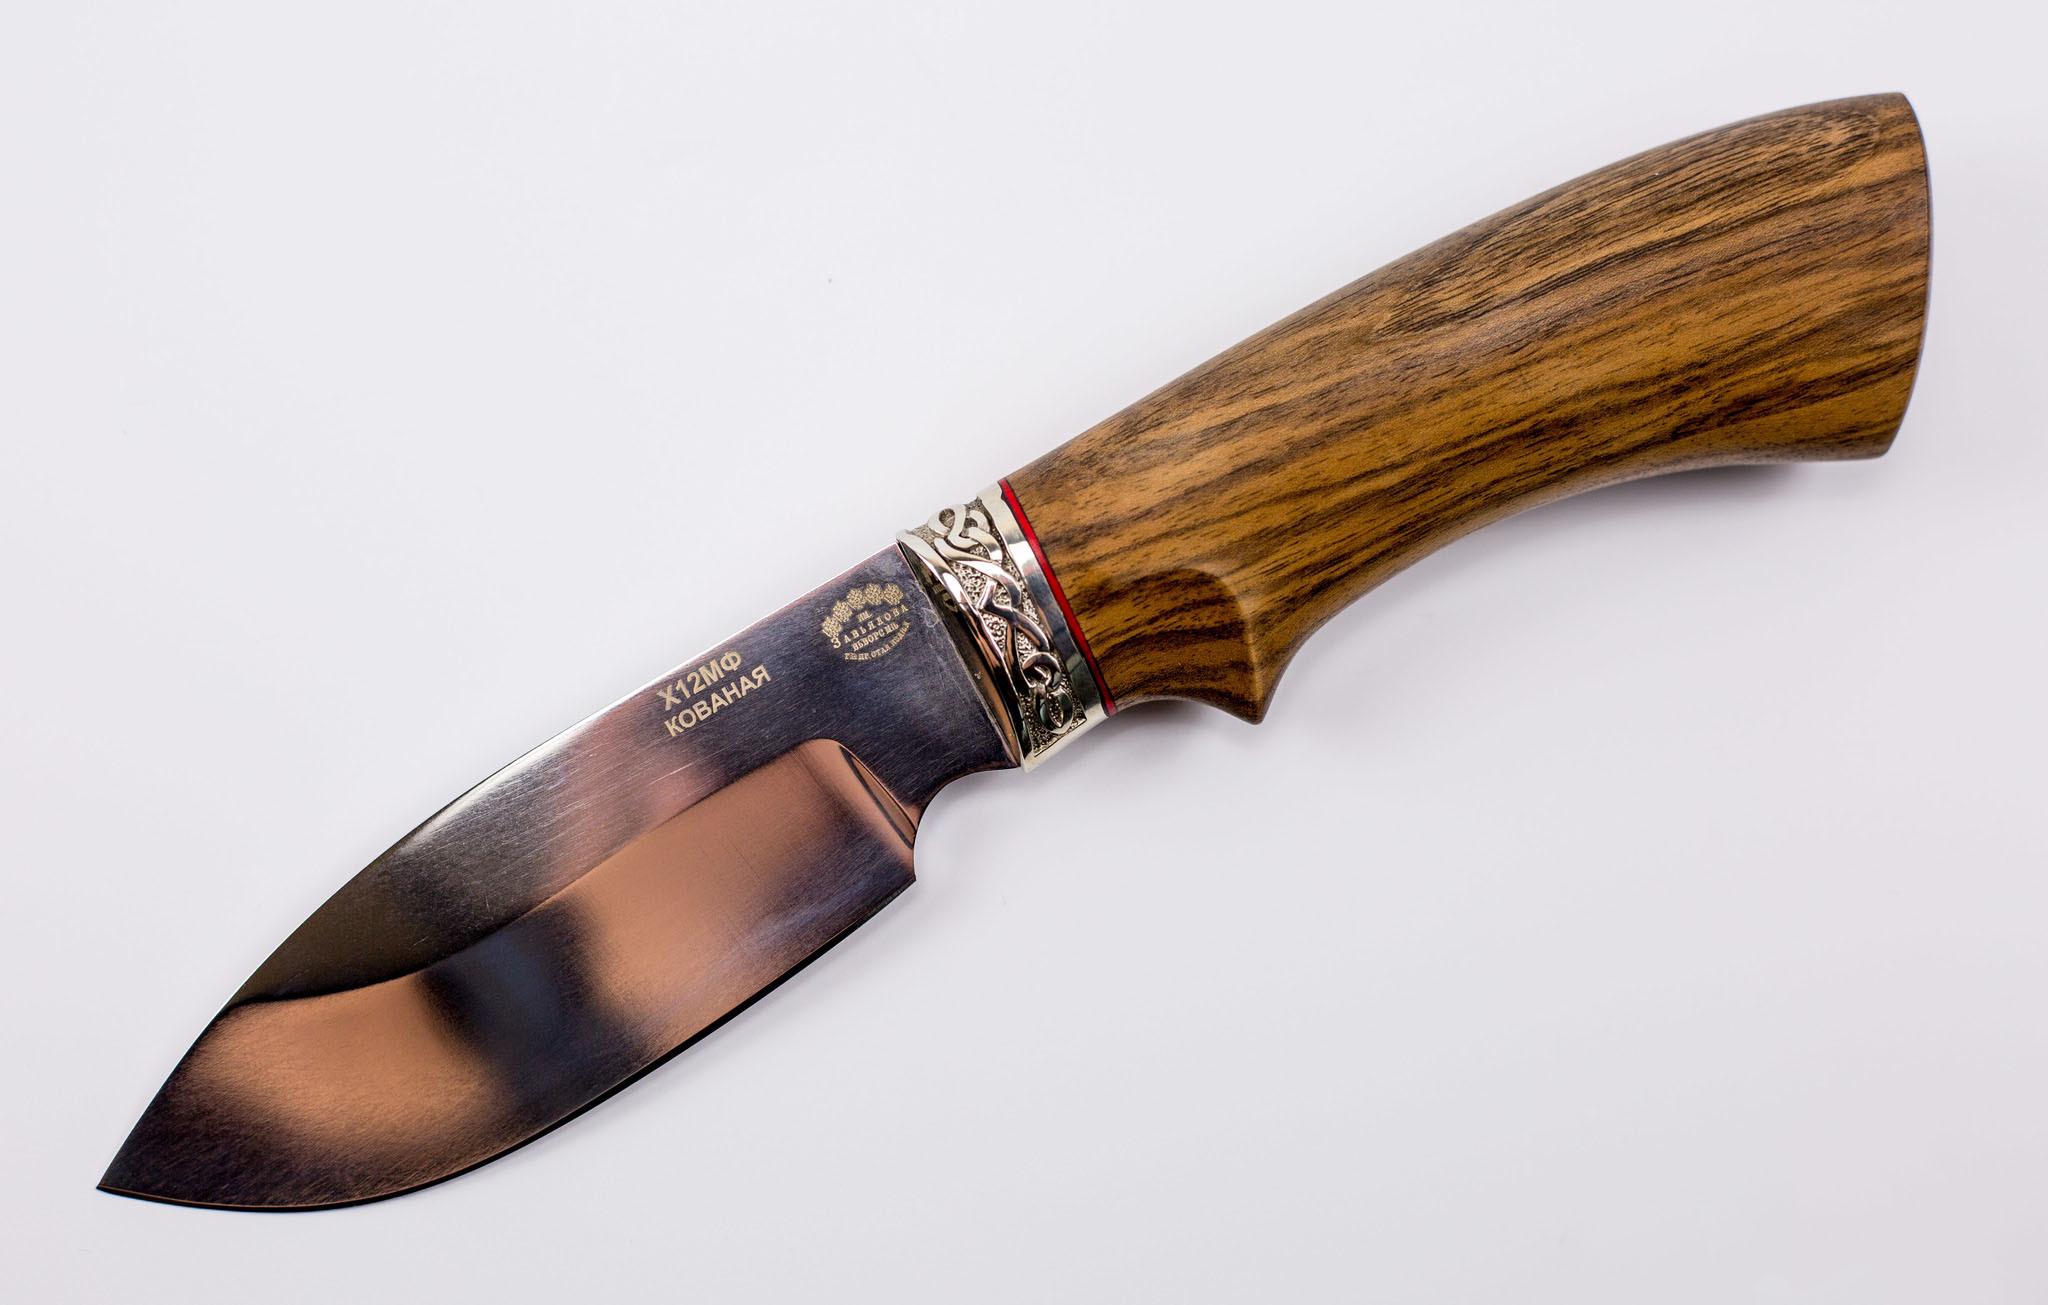 Фото 13 - Нож Бобер, сталь Х12МФ, рукоять дерево от Кузница Завьялова